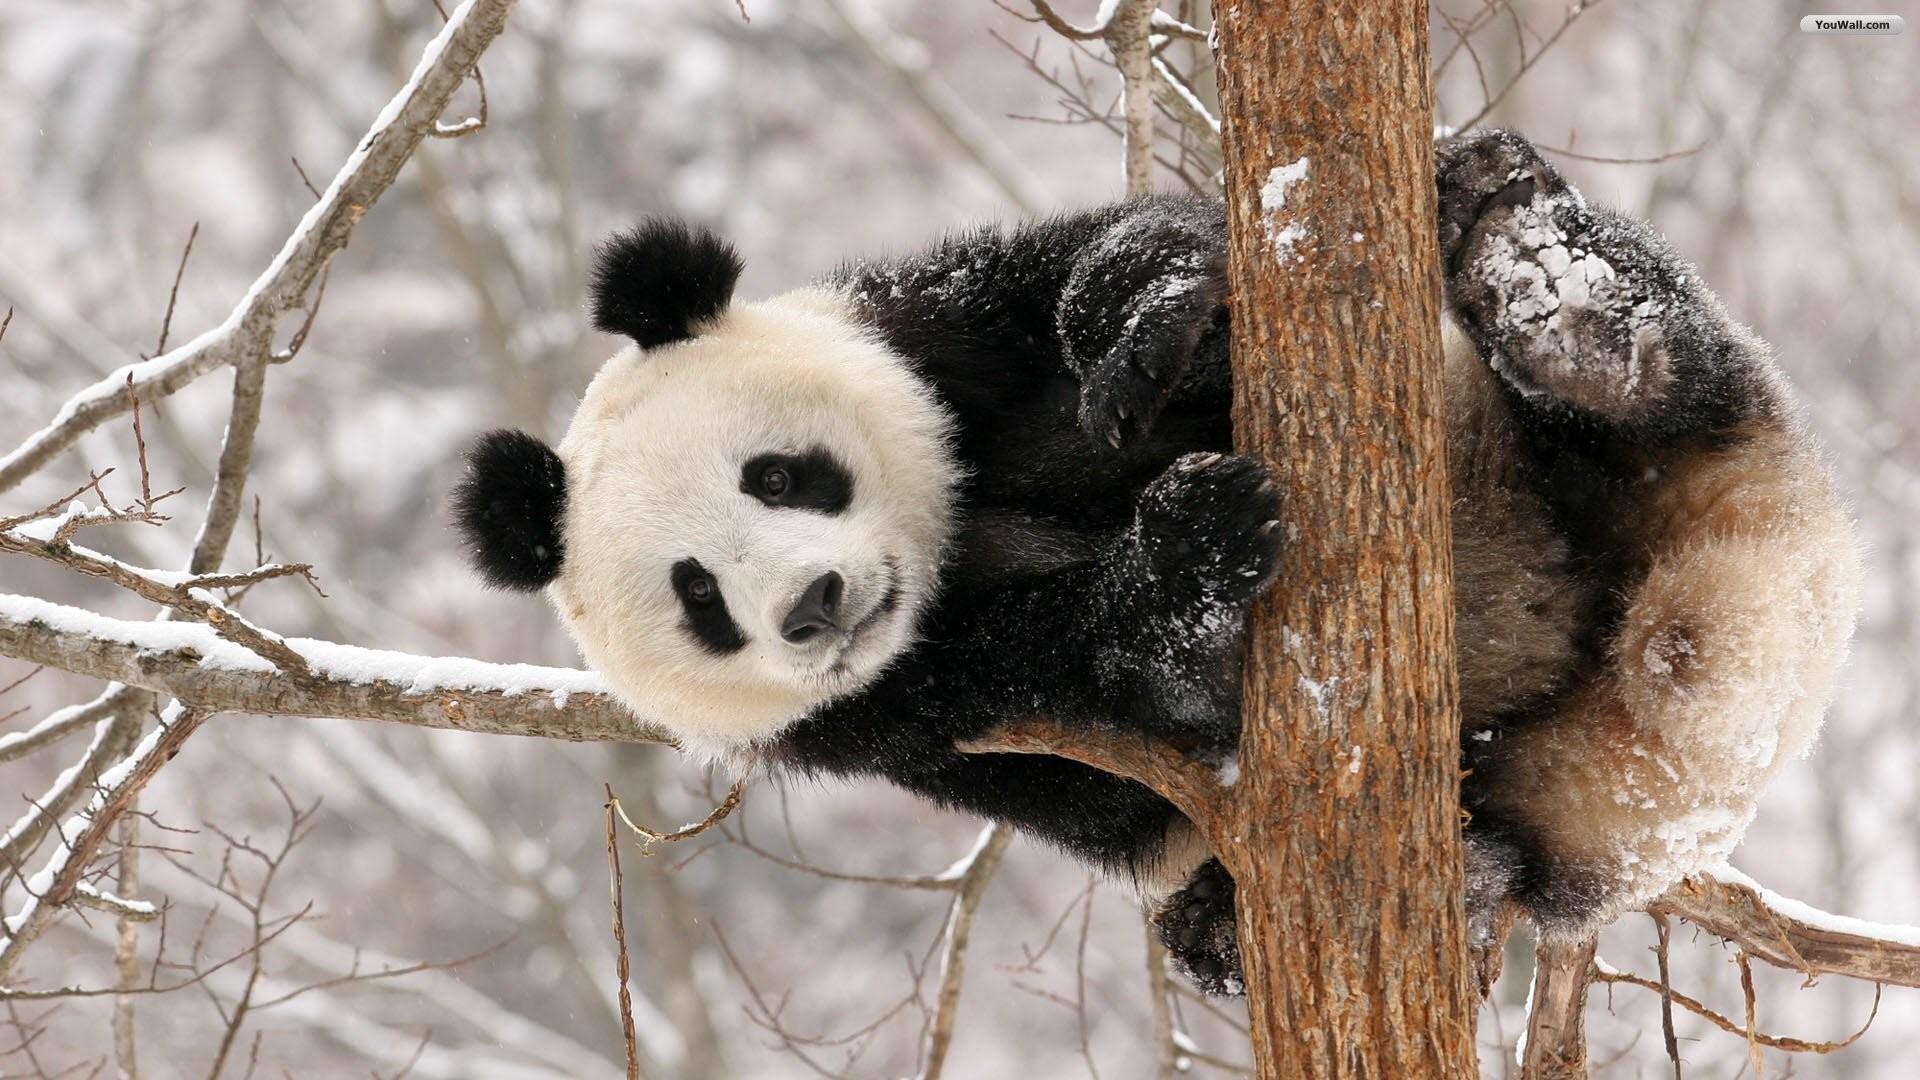 YouWall – Cute Panda Wallpaper – wallpaper,wallpapers,free wallpaper .